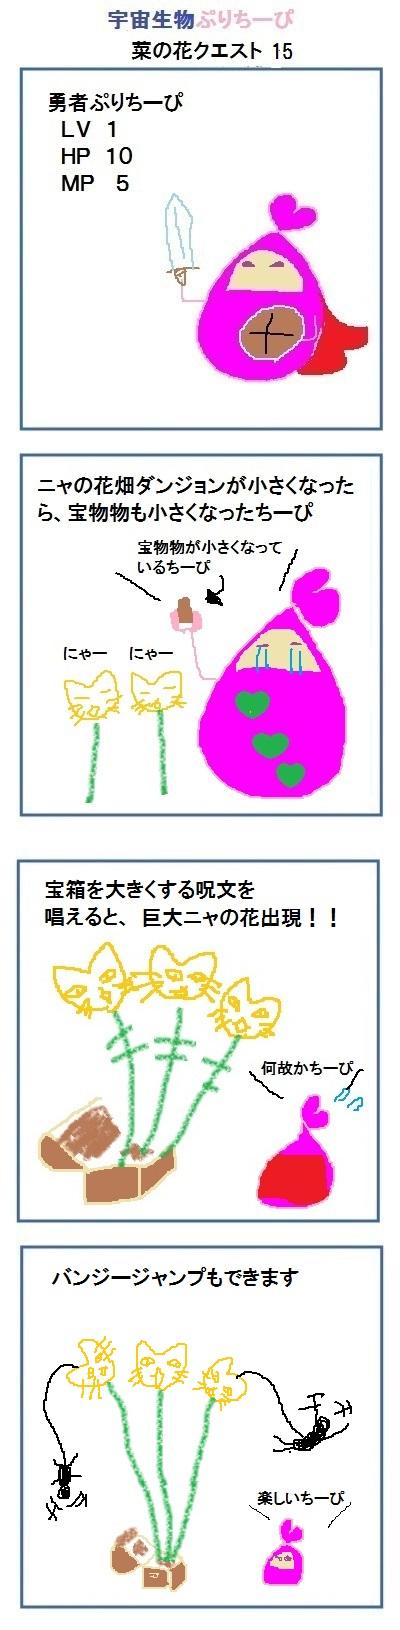 160328_nanohana_quest15.jpg